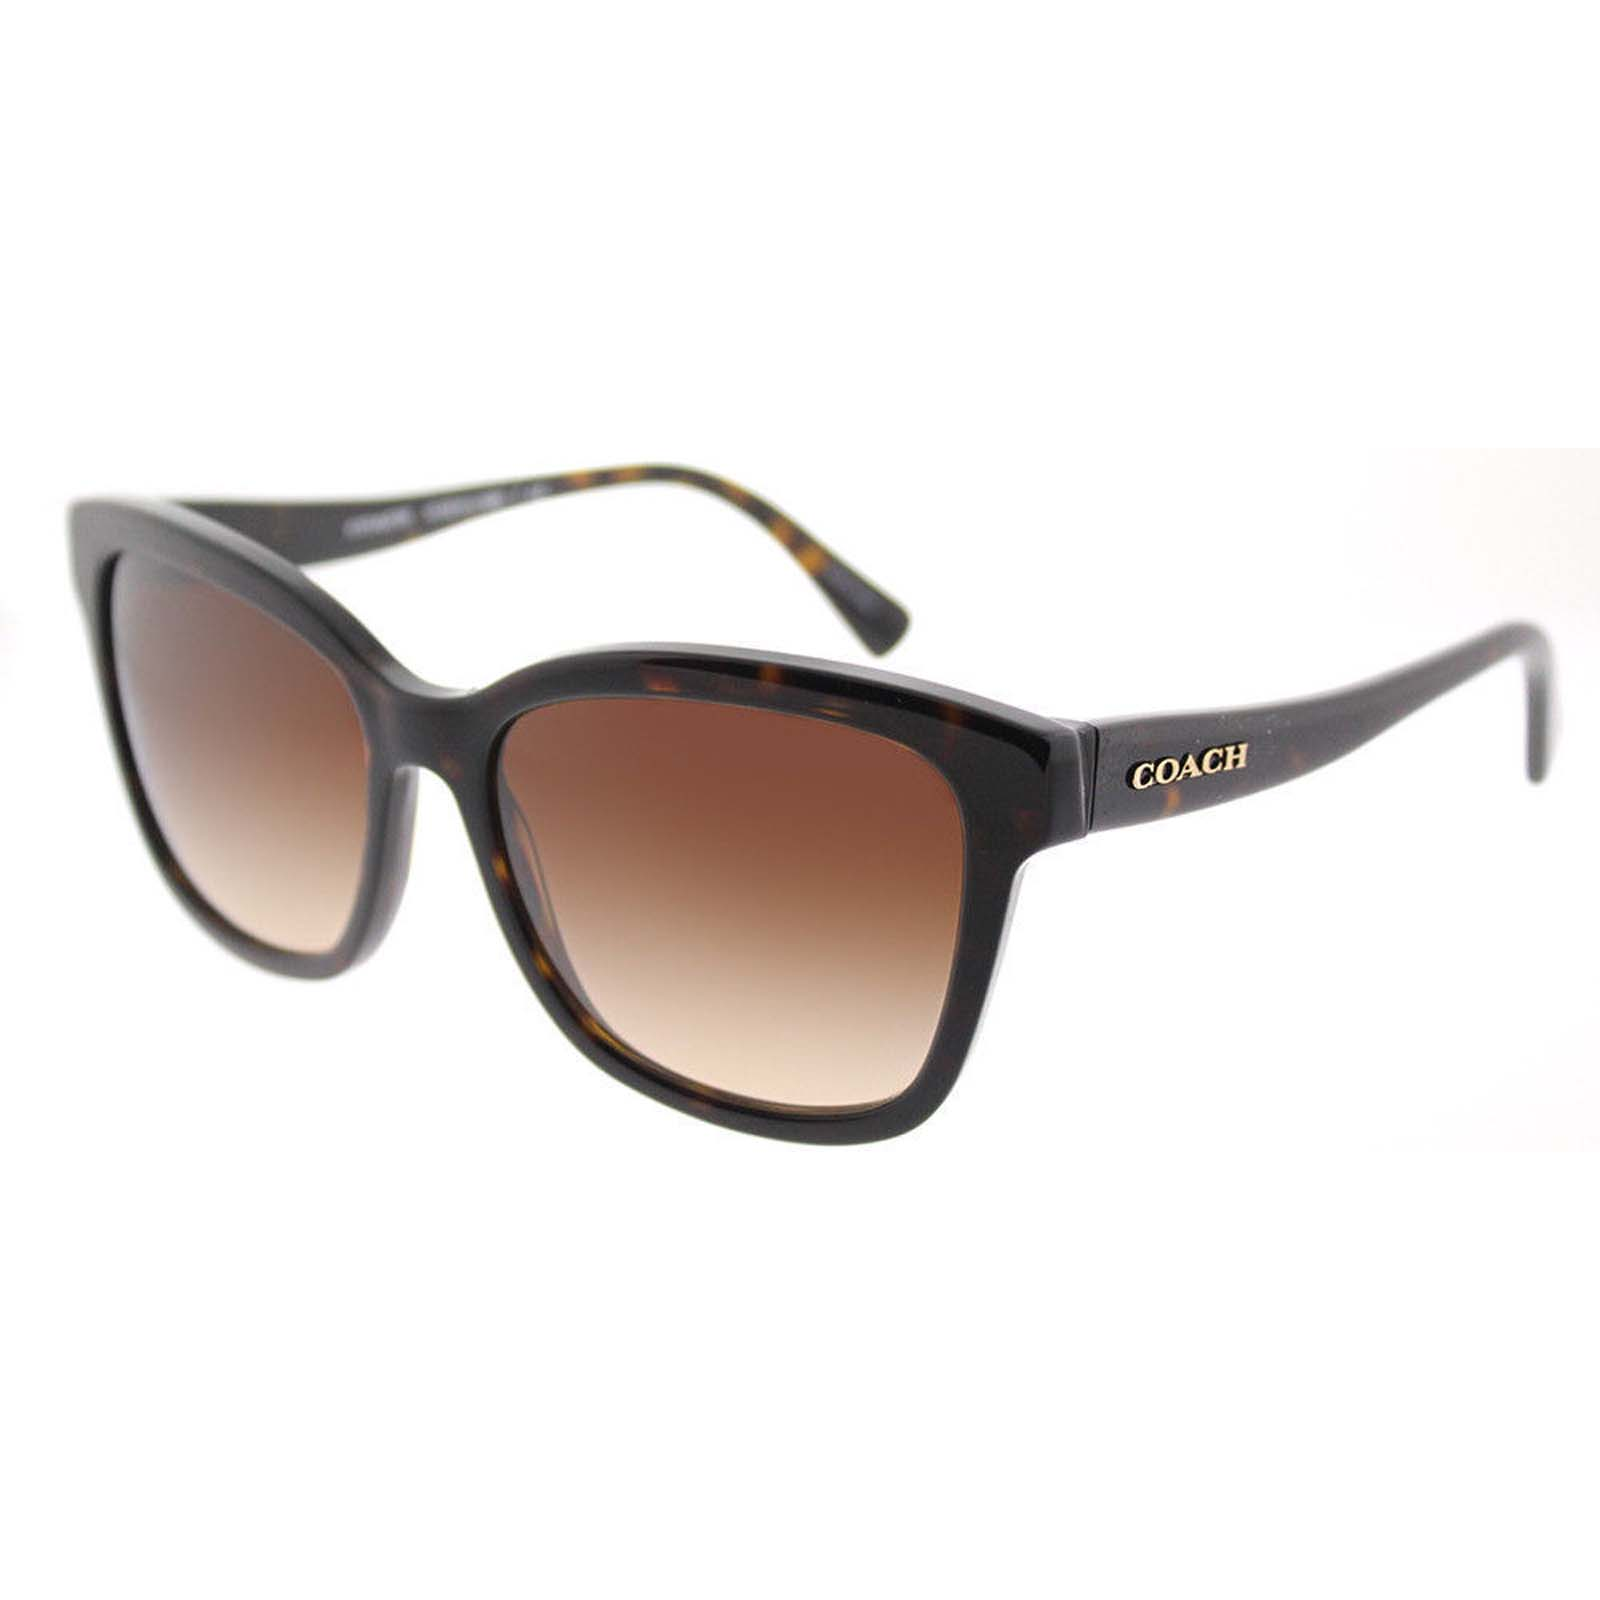 7246858d65 Coach HC 8219 512013 Dark Tortoise Plastic Sunglasses Brown Gradient ...